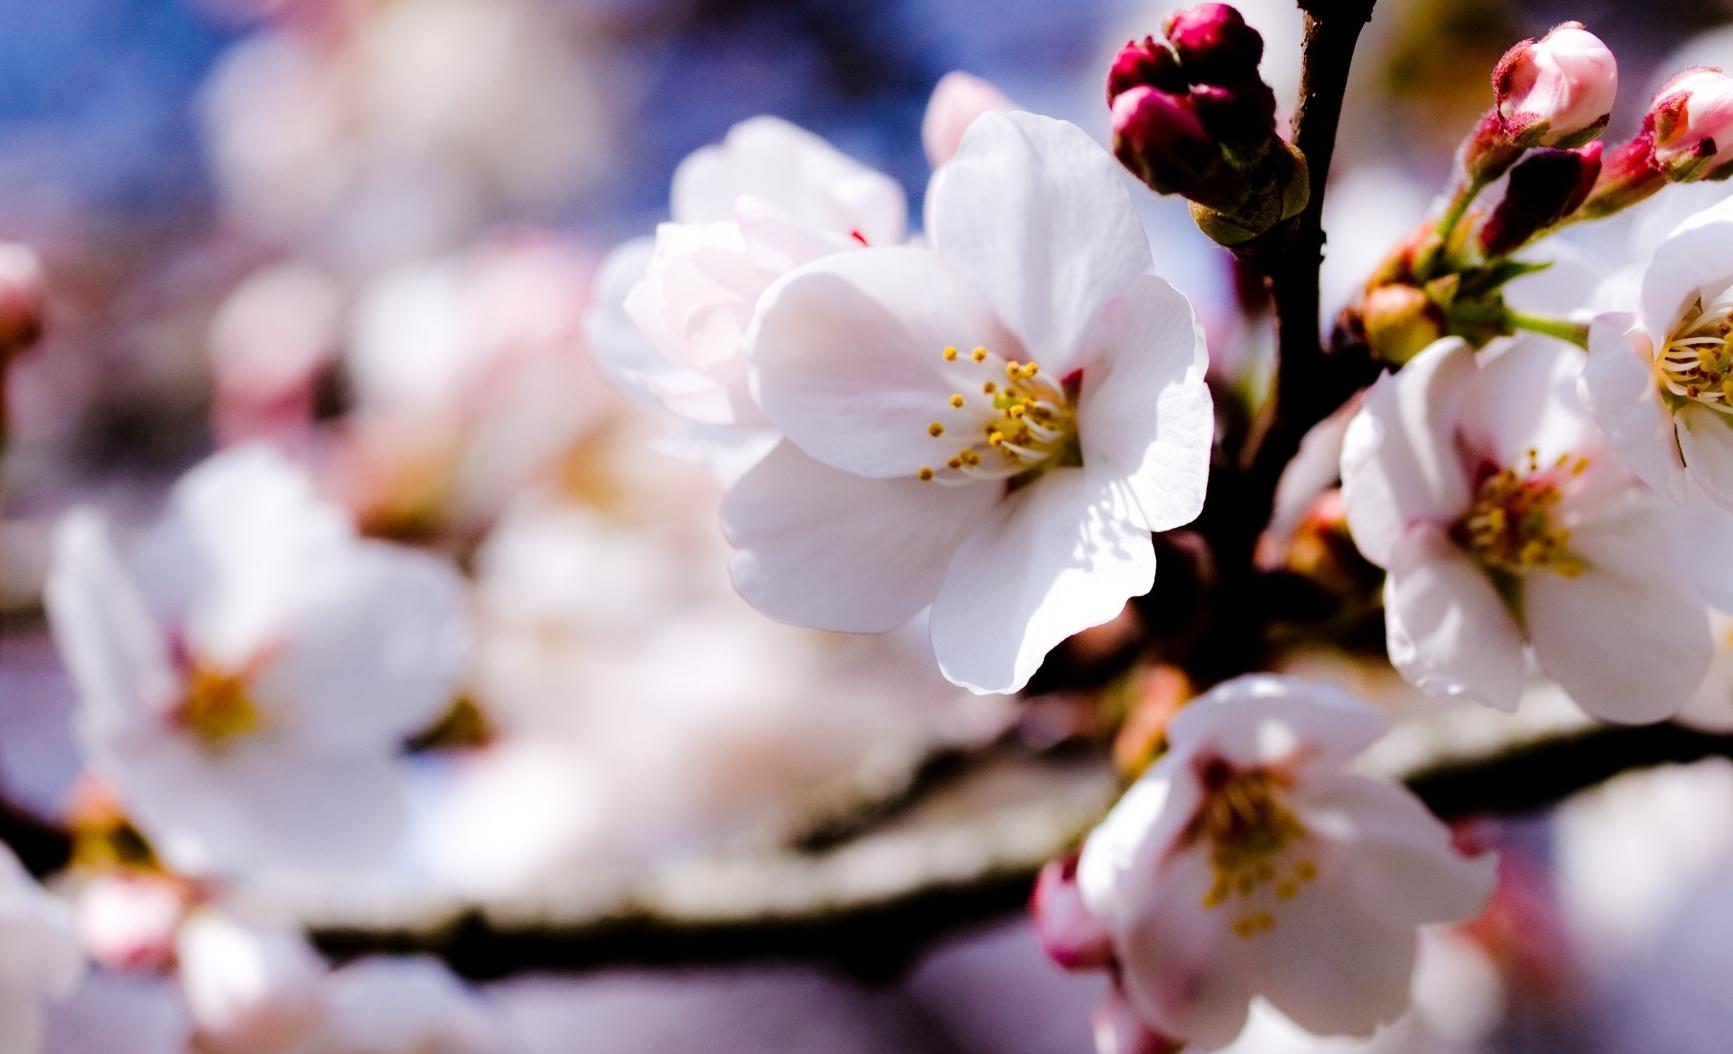 white_spring_flowers_on_a_tree_branch-wallpaper-1920x1080-masolata.jpg